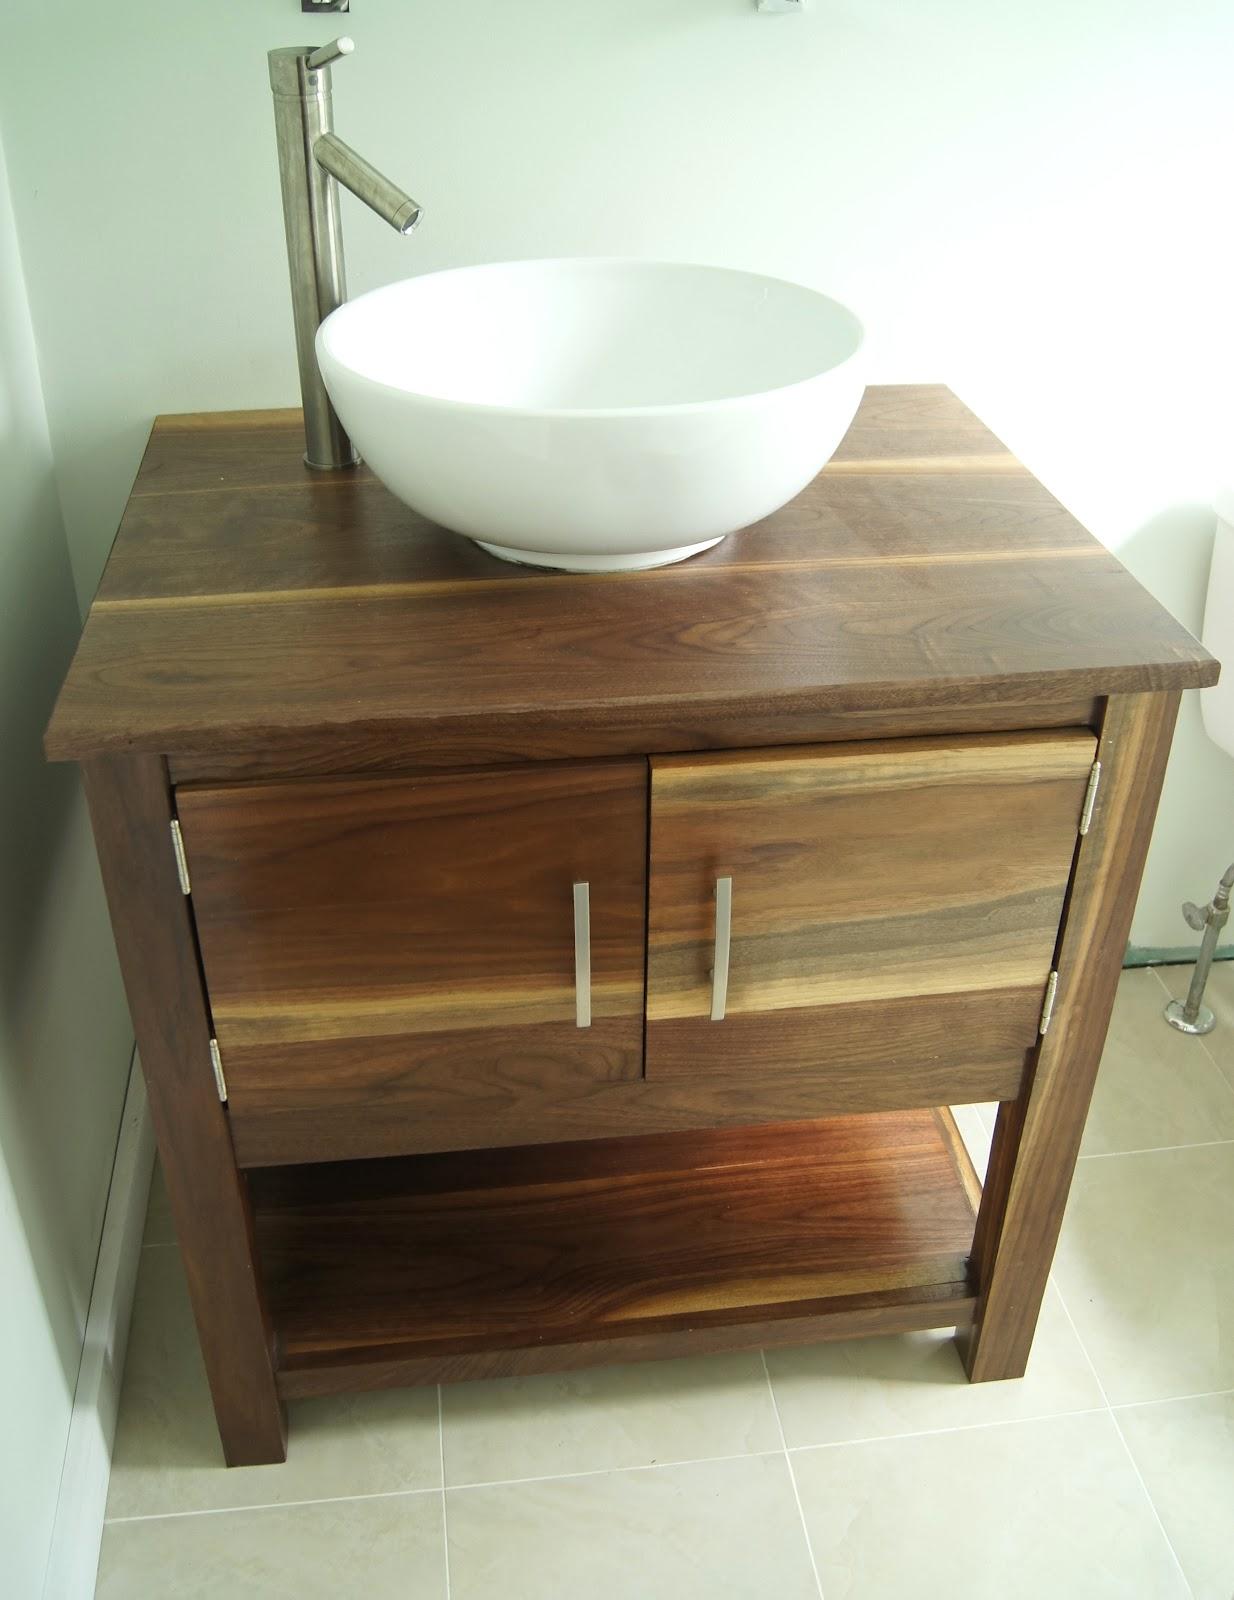 Wightman Specialty Woods: DIY Bathroom Vanity